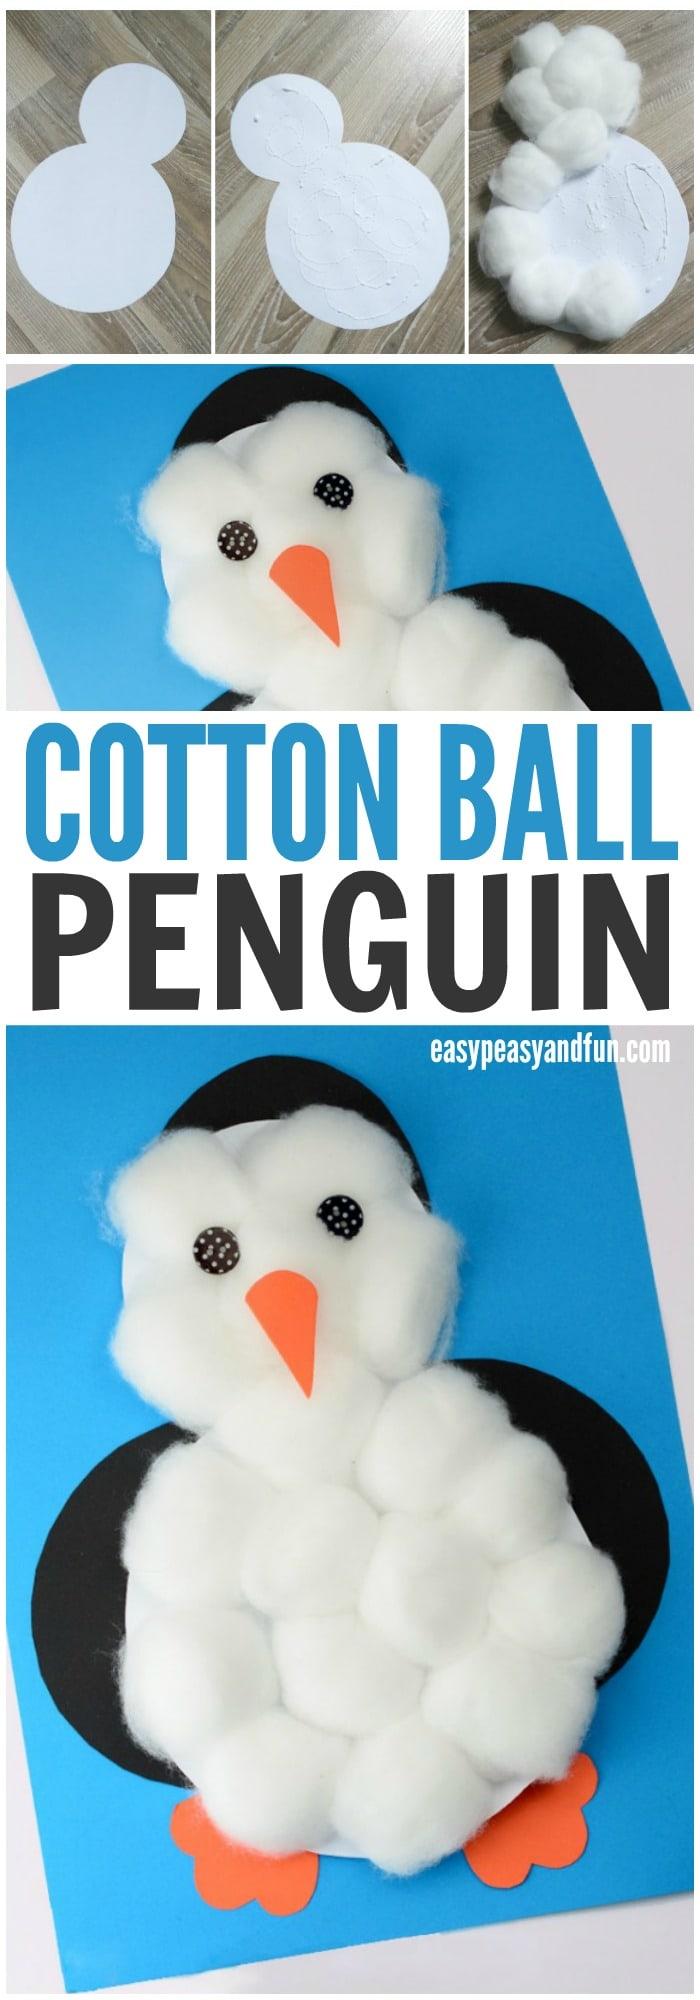 Adorable Cotton Balls Penguin Craft for Kids to Make